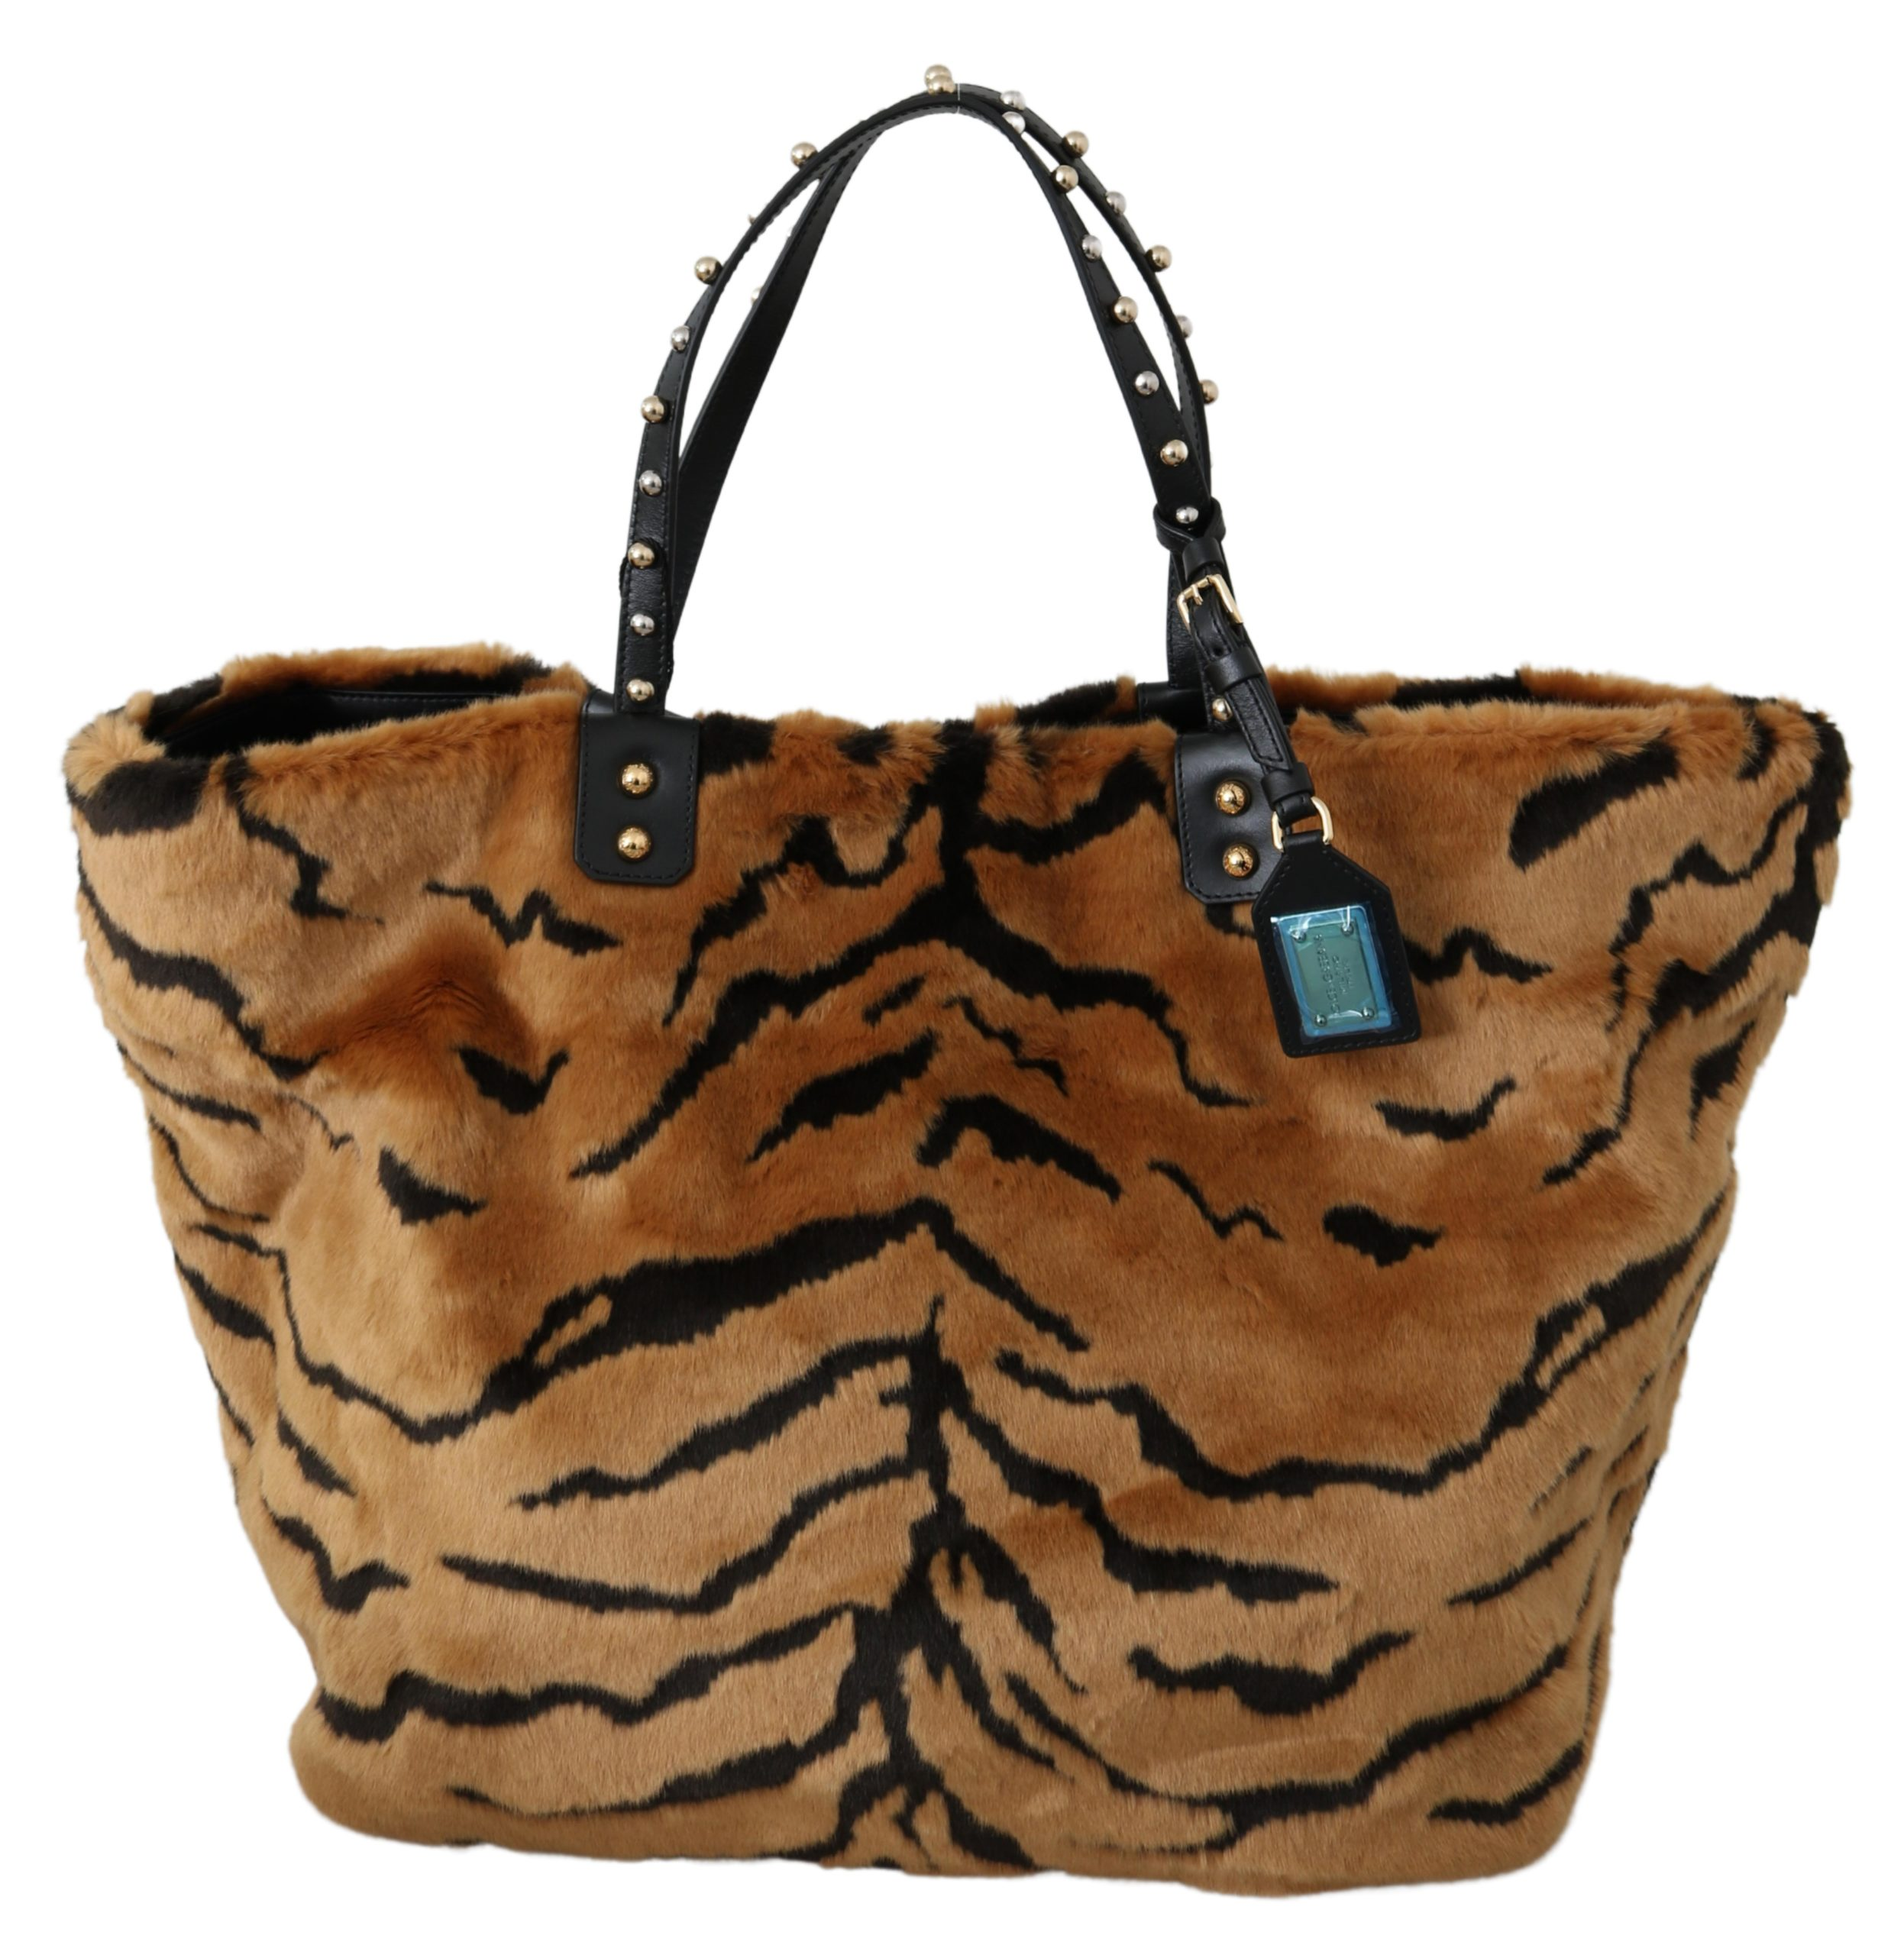 Dolce & Gabbana Women's Tiger Beatrice Tote Bag Brown VAS9607